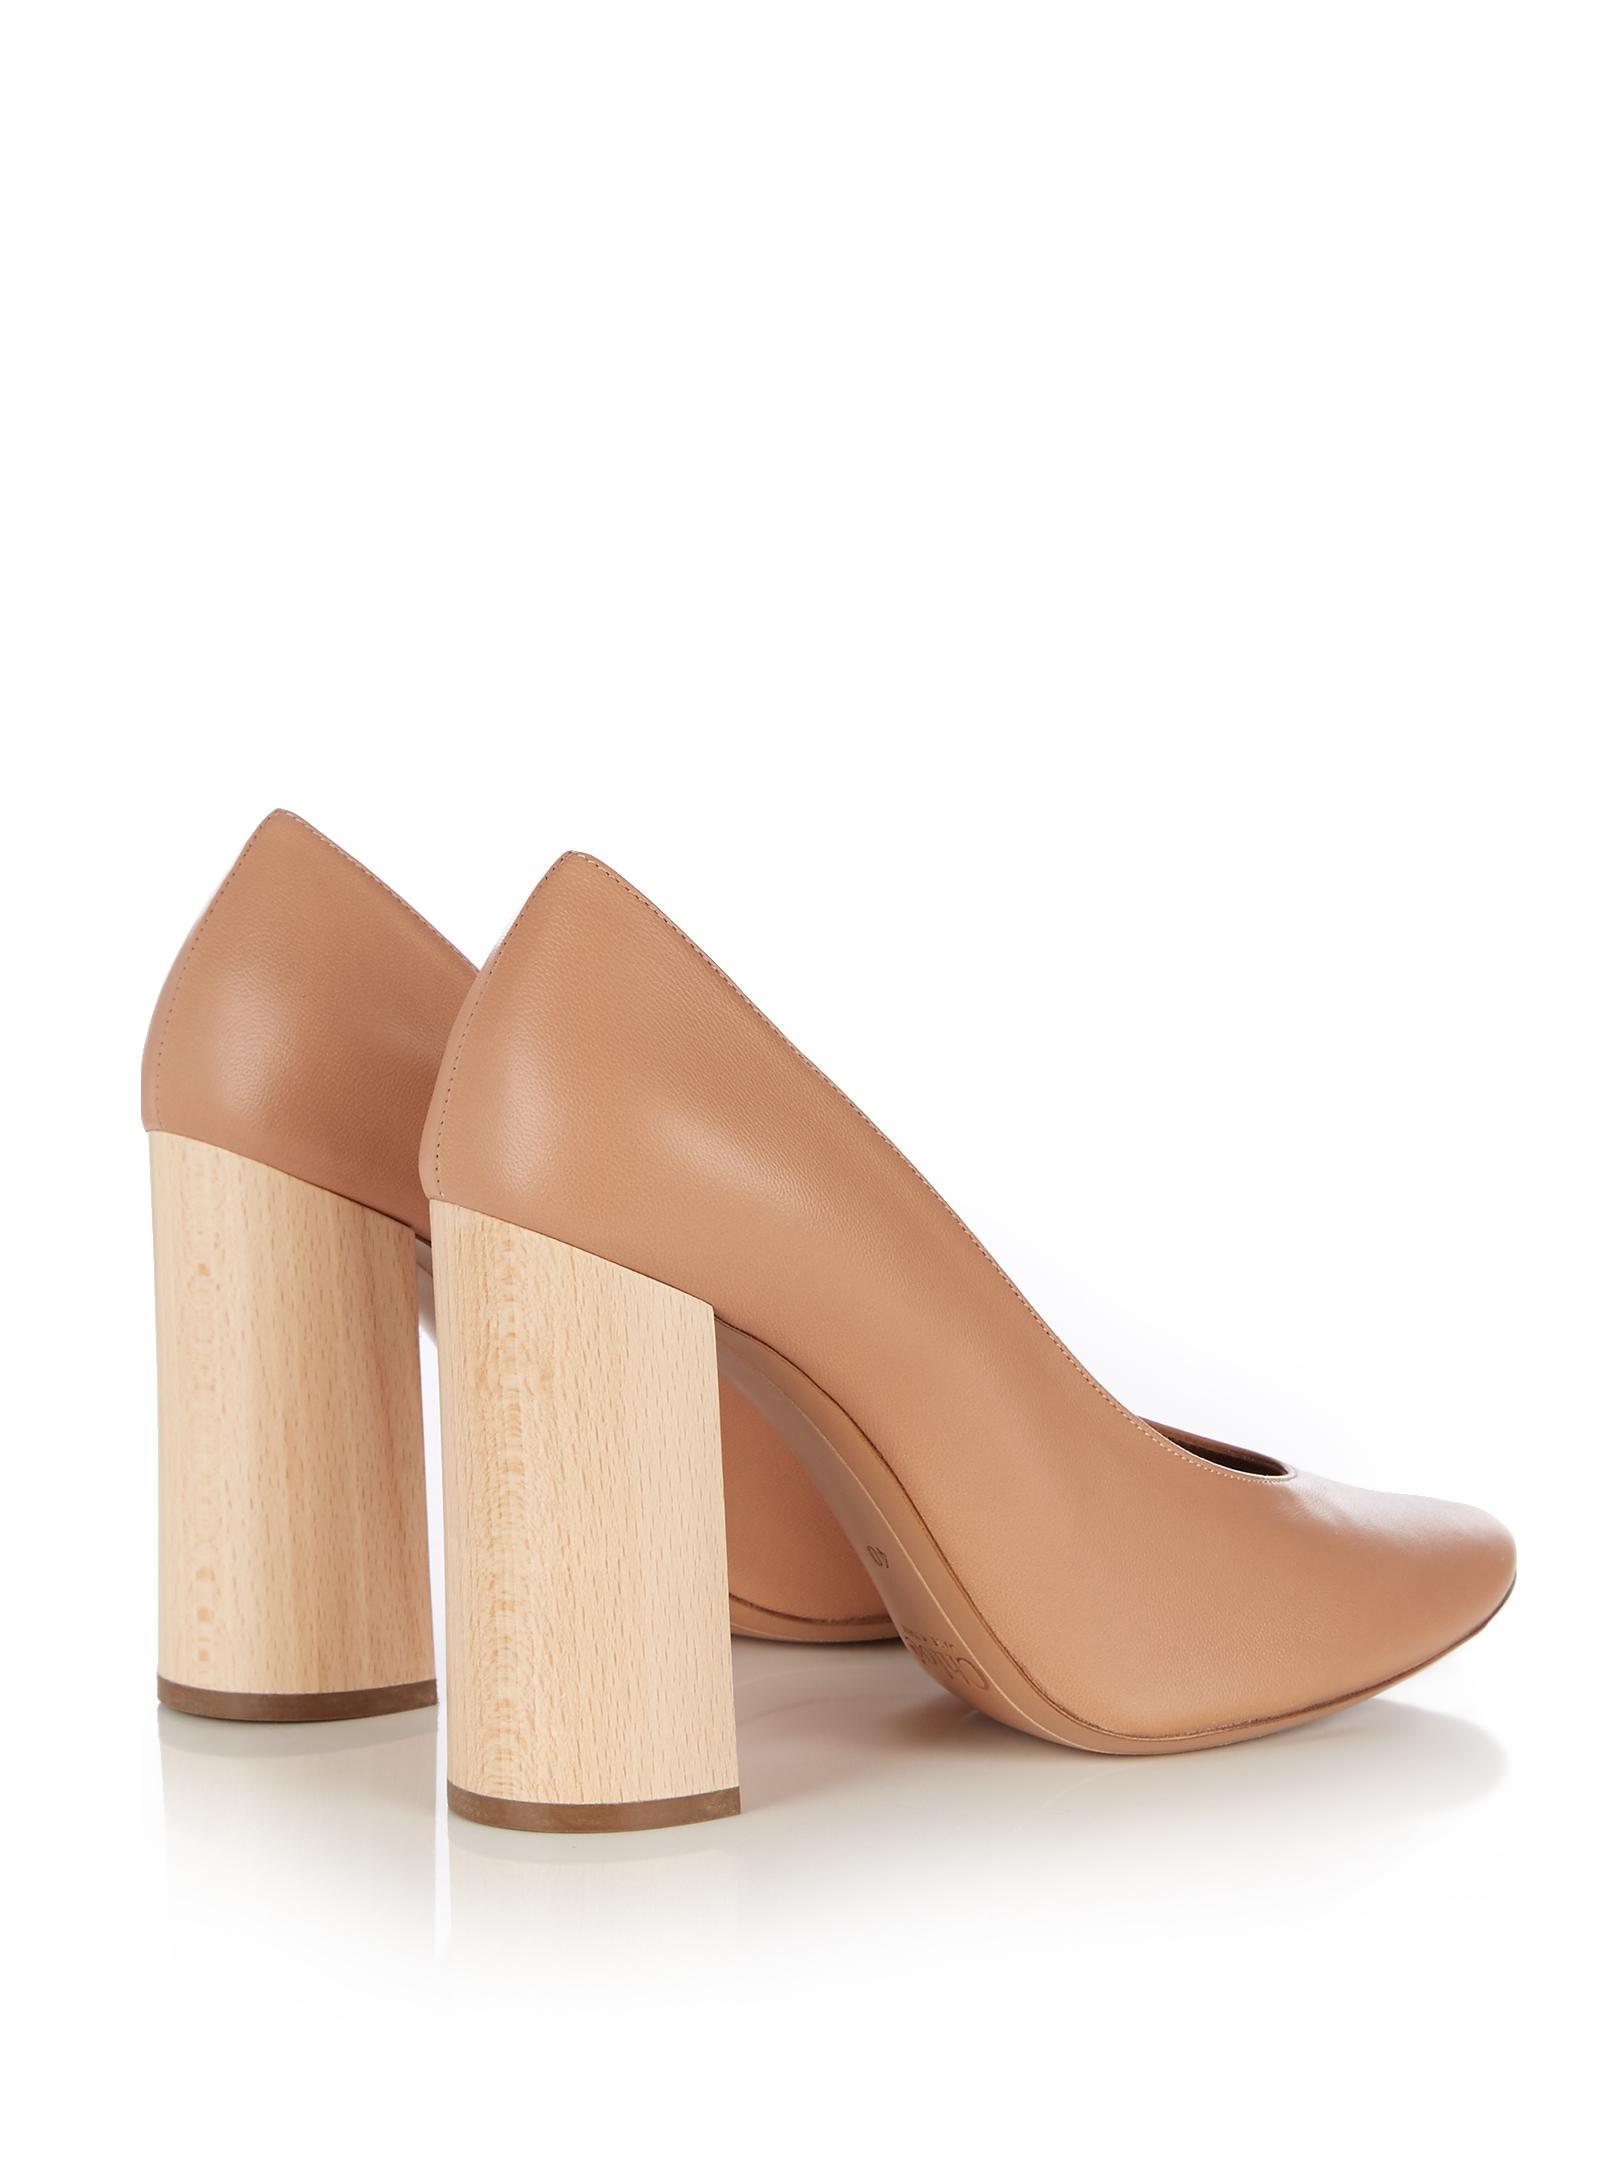 Frank And Oak Women S Shoes